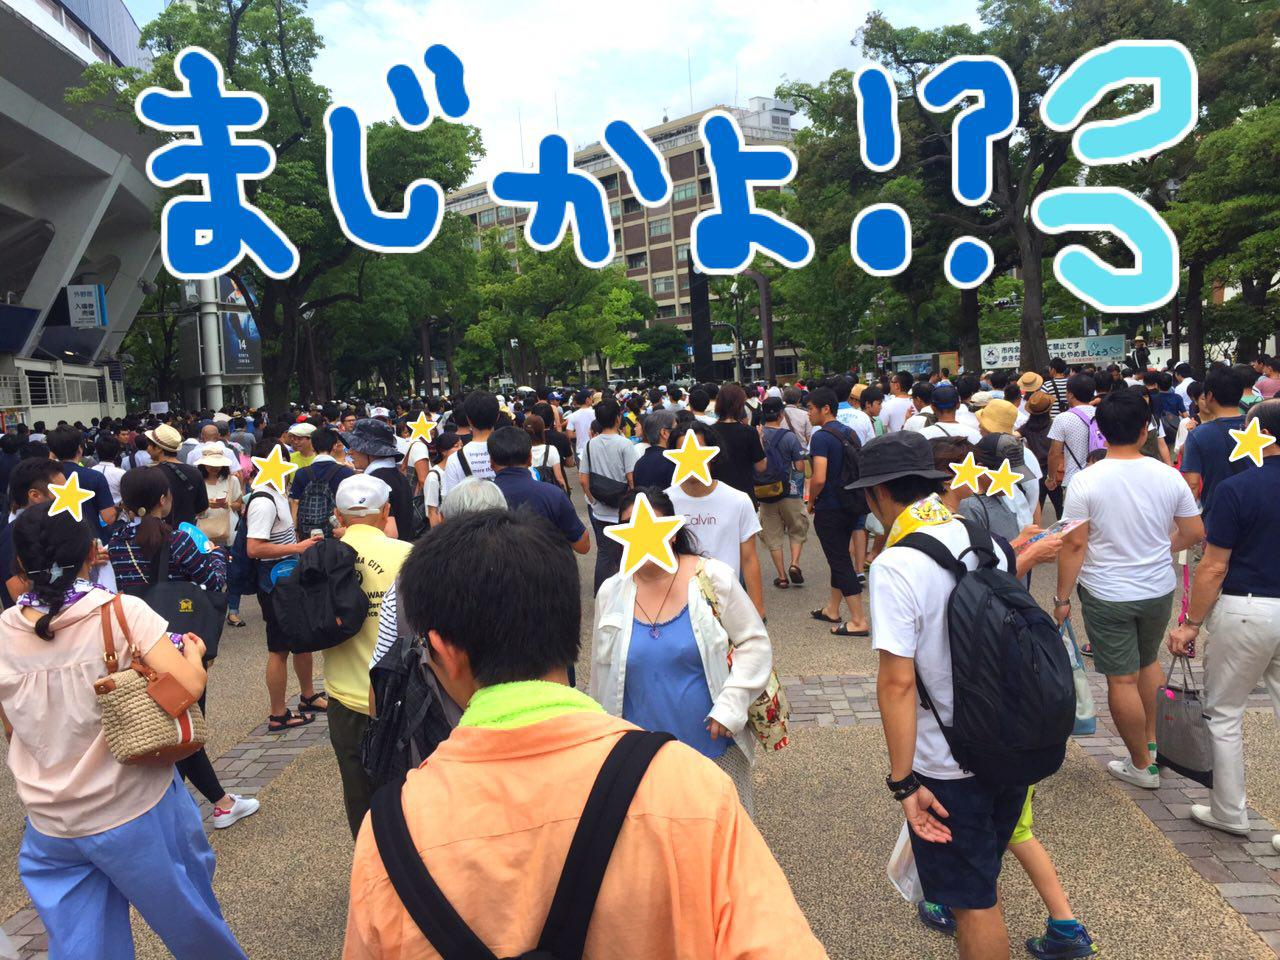 photo_2017-07-29_22-54-03.jpg